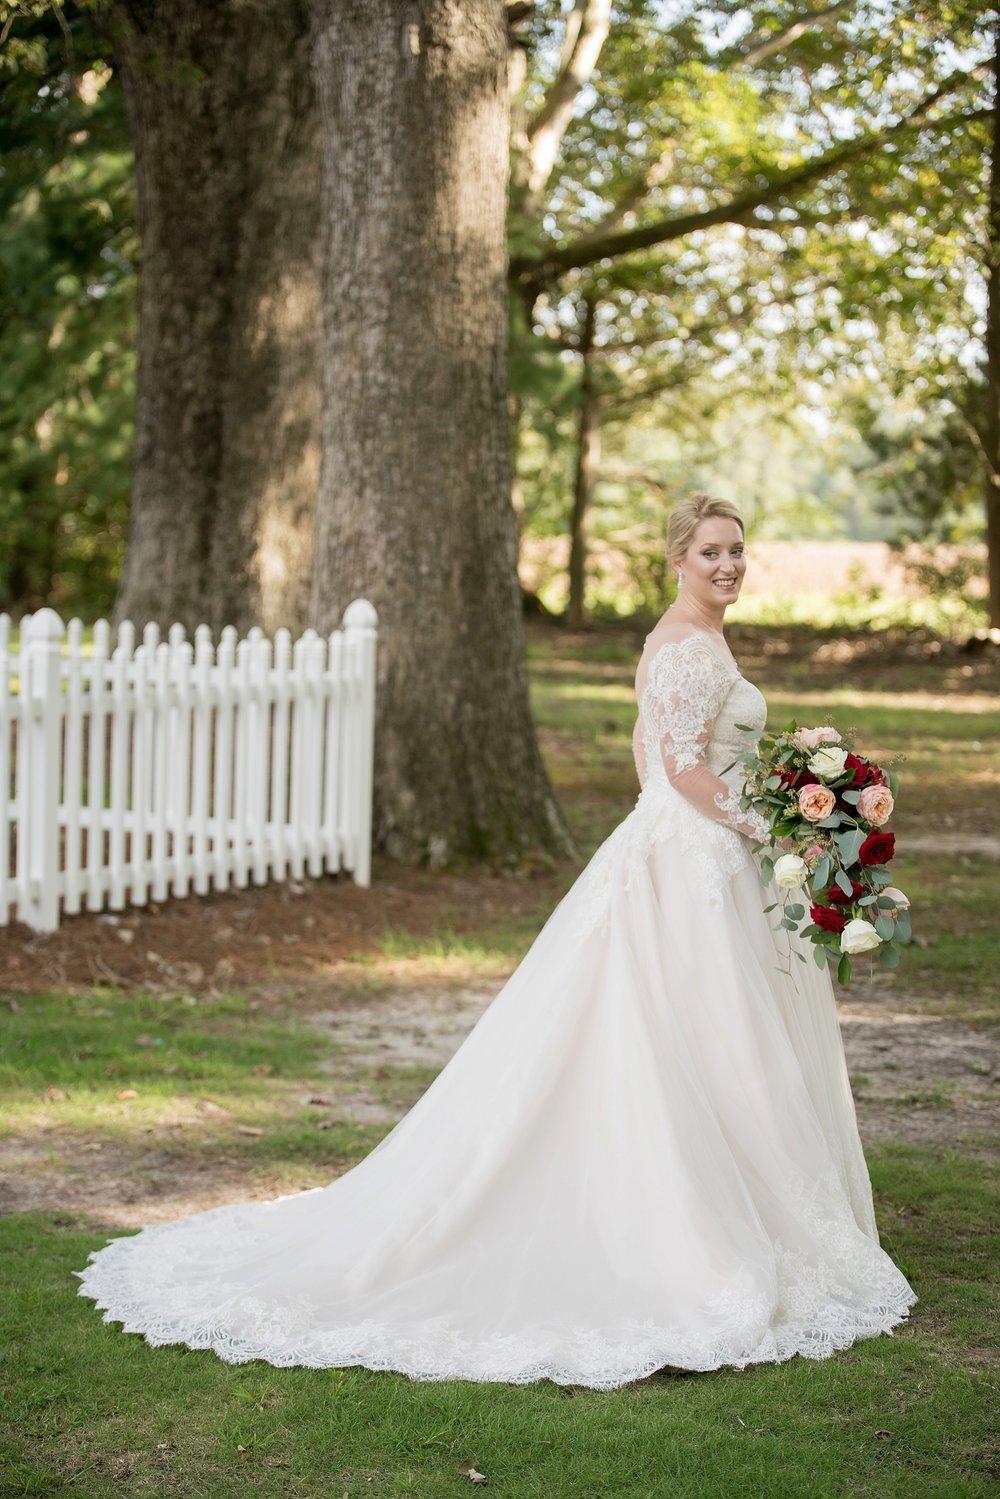 Longstraw-Farms-Wedding-Photographer-056.jpg